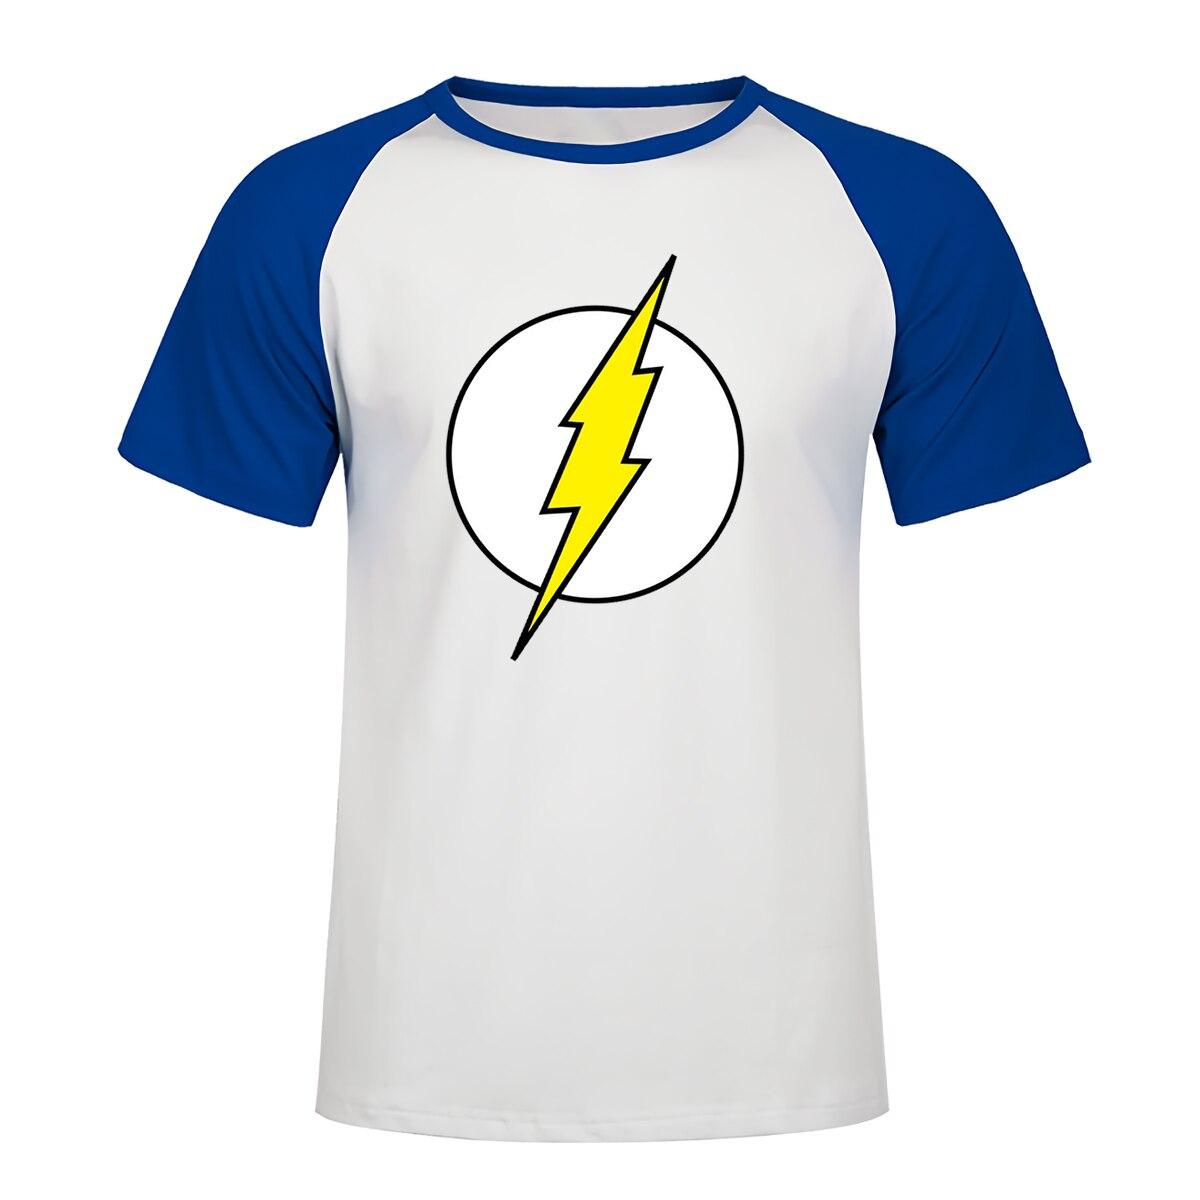 The BIG BANG Theory T SHIRT The Flash Print Men T Shirts Hot Selling Casual Harajuku Tee Shirt S XXL Cotton Clothing Dropship in T Shirts from Men 39 s Clothing